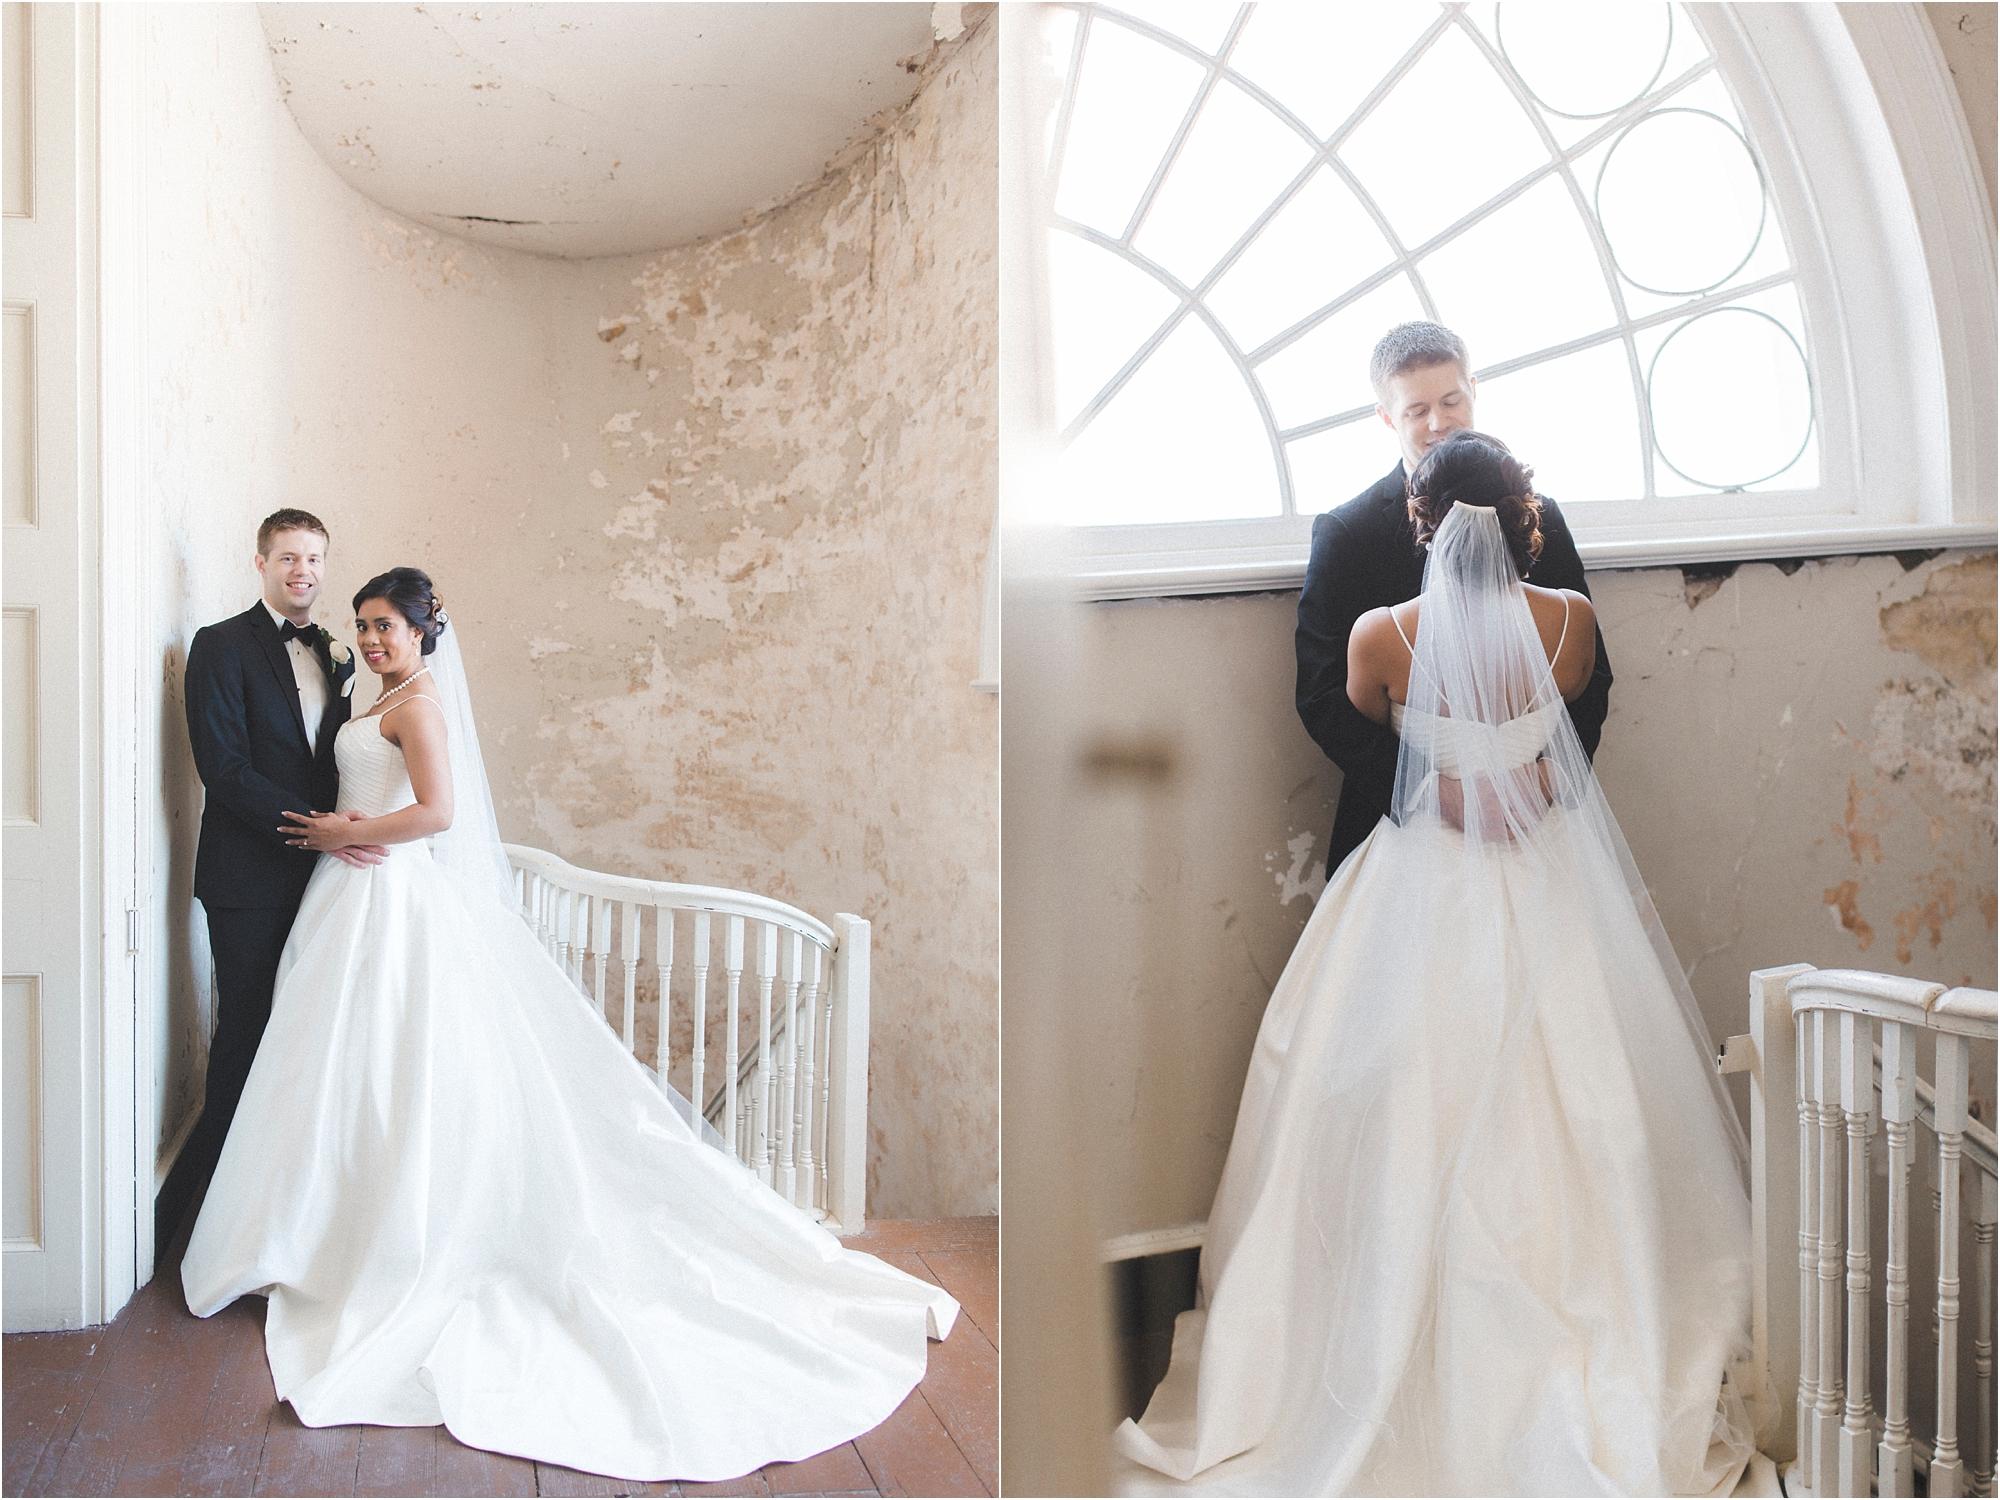 stephanie-yonce-photography-historic-church-virginia-museu-fine-arts-wedding-photos_026.JPG